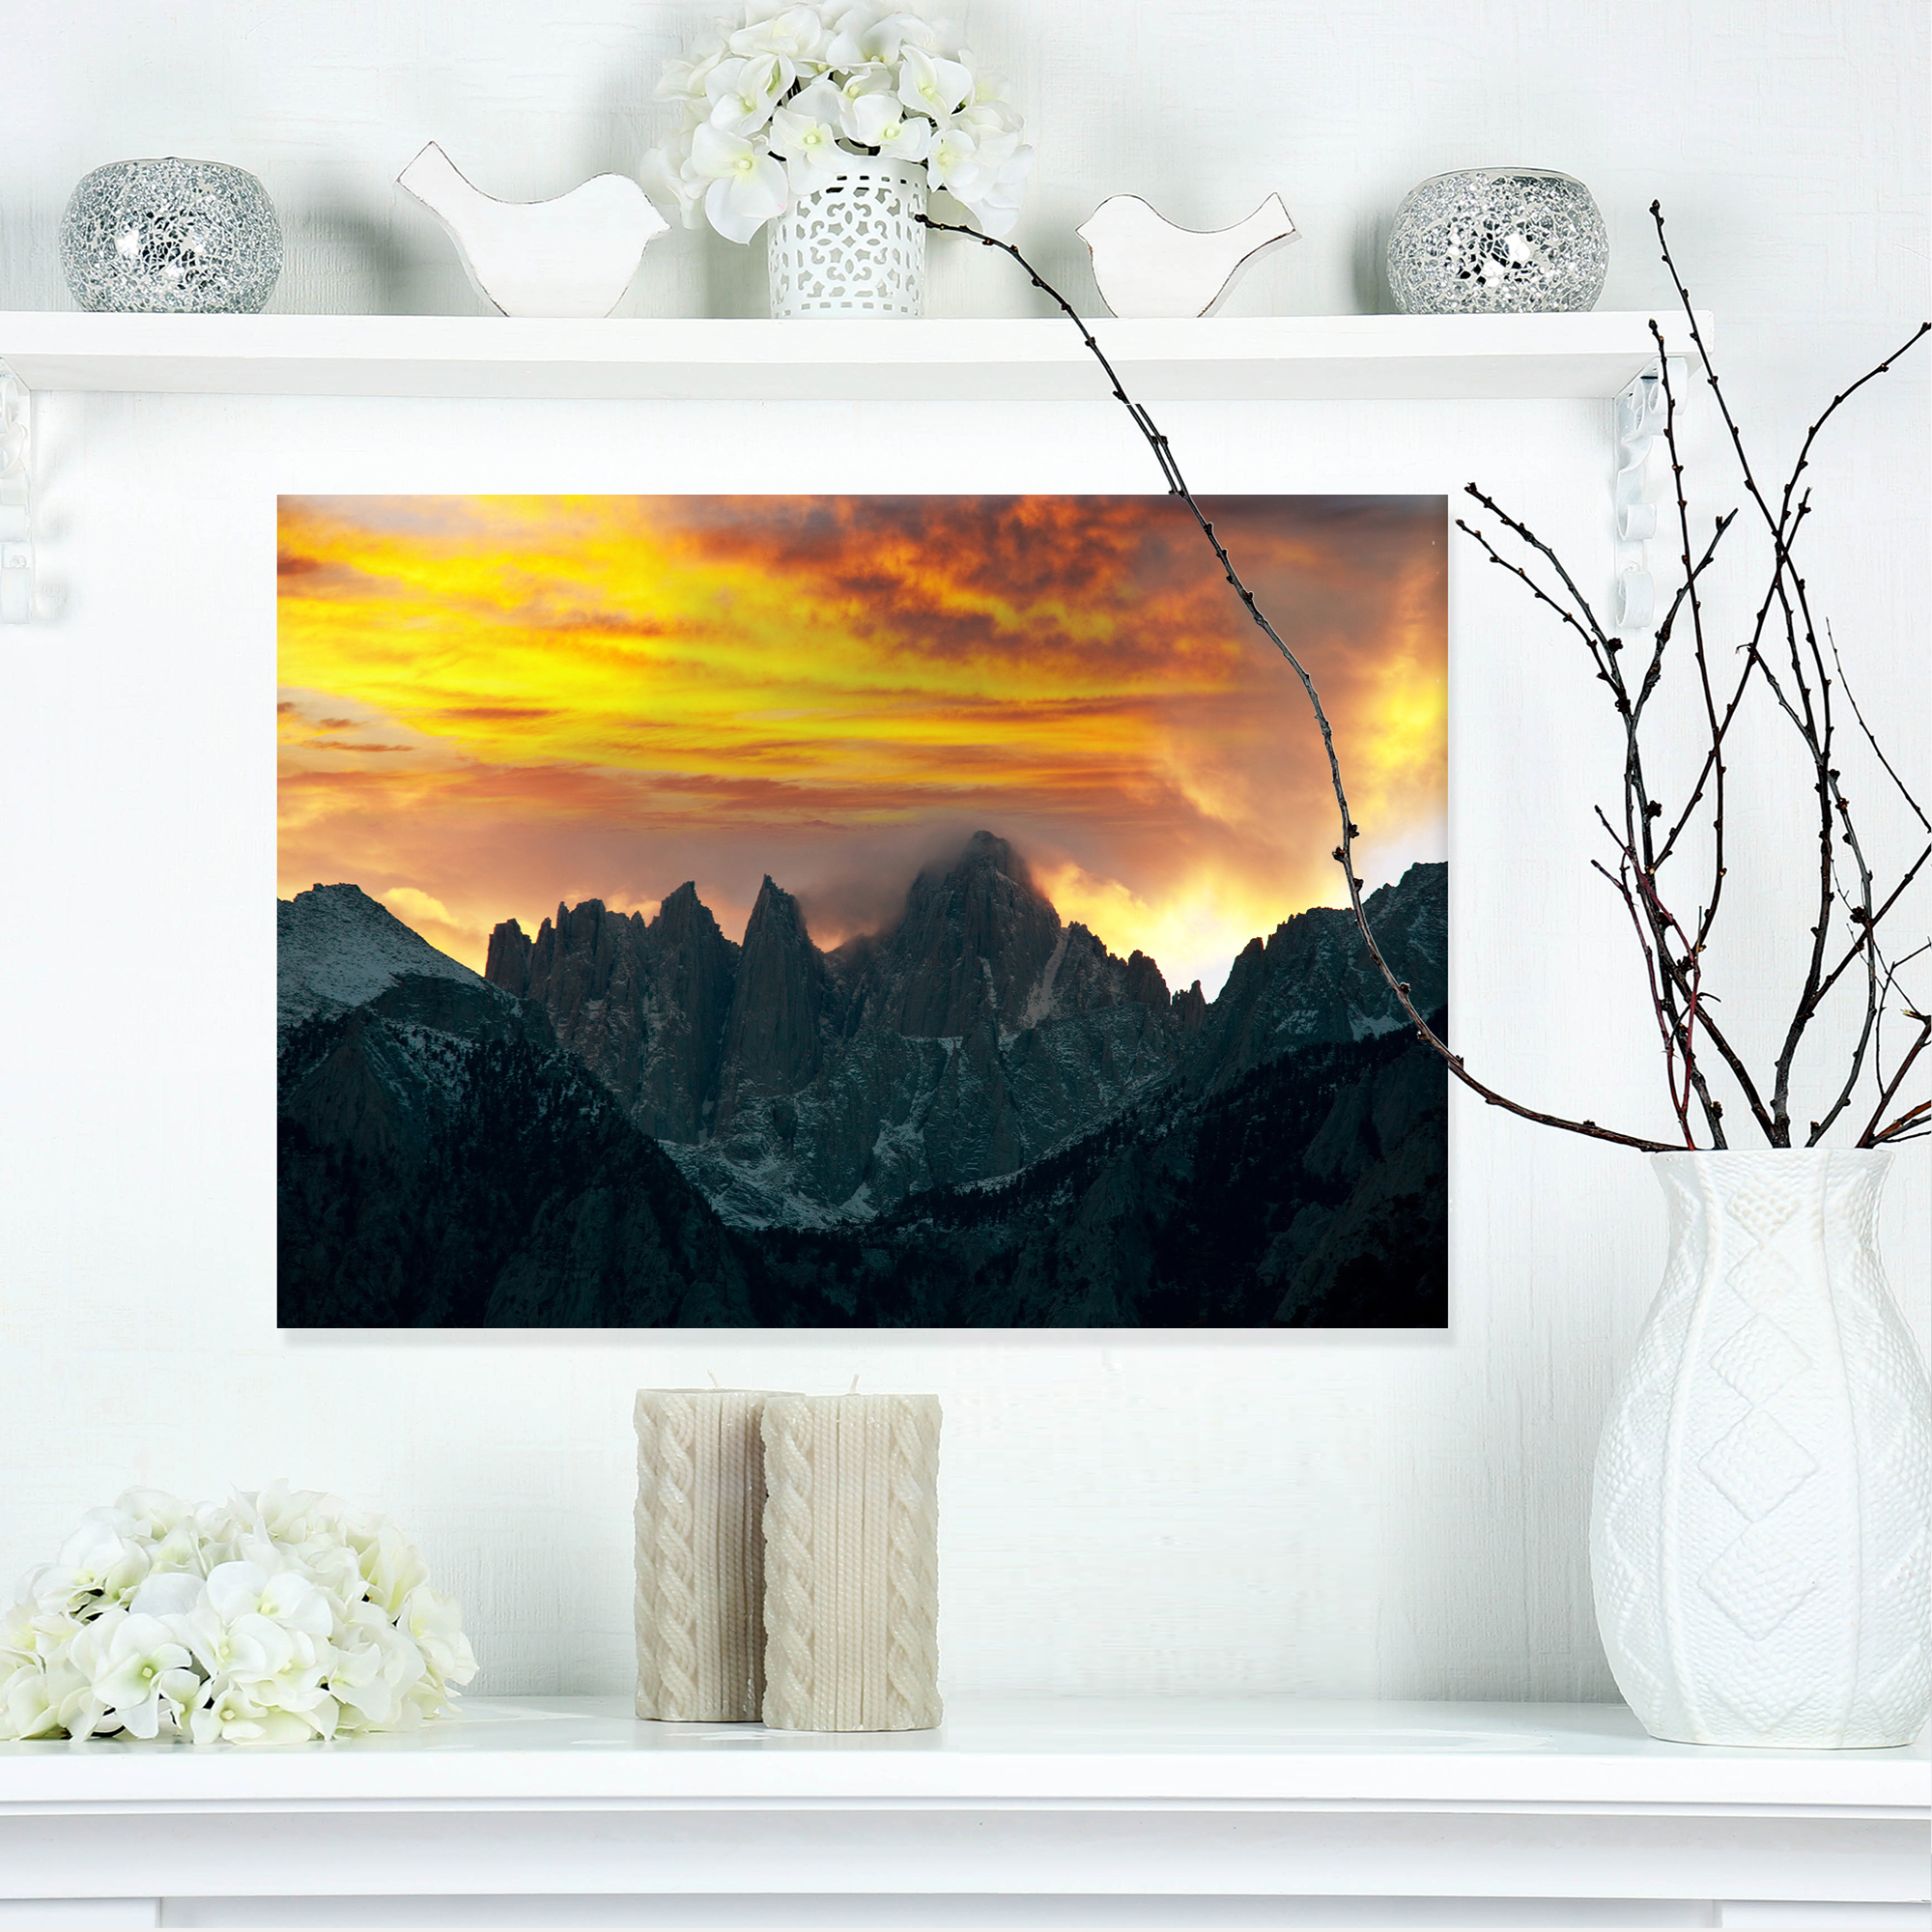 Whitney Mountains under Cloudy Sky - Oversized Landscape Canvas Art - image 3 of 3